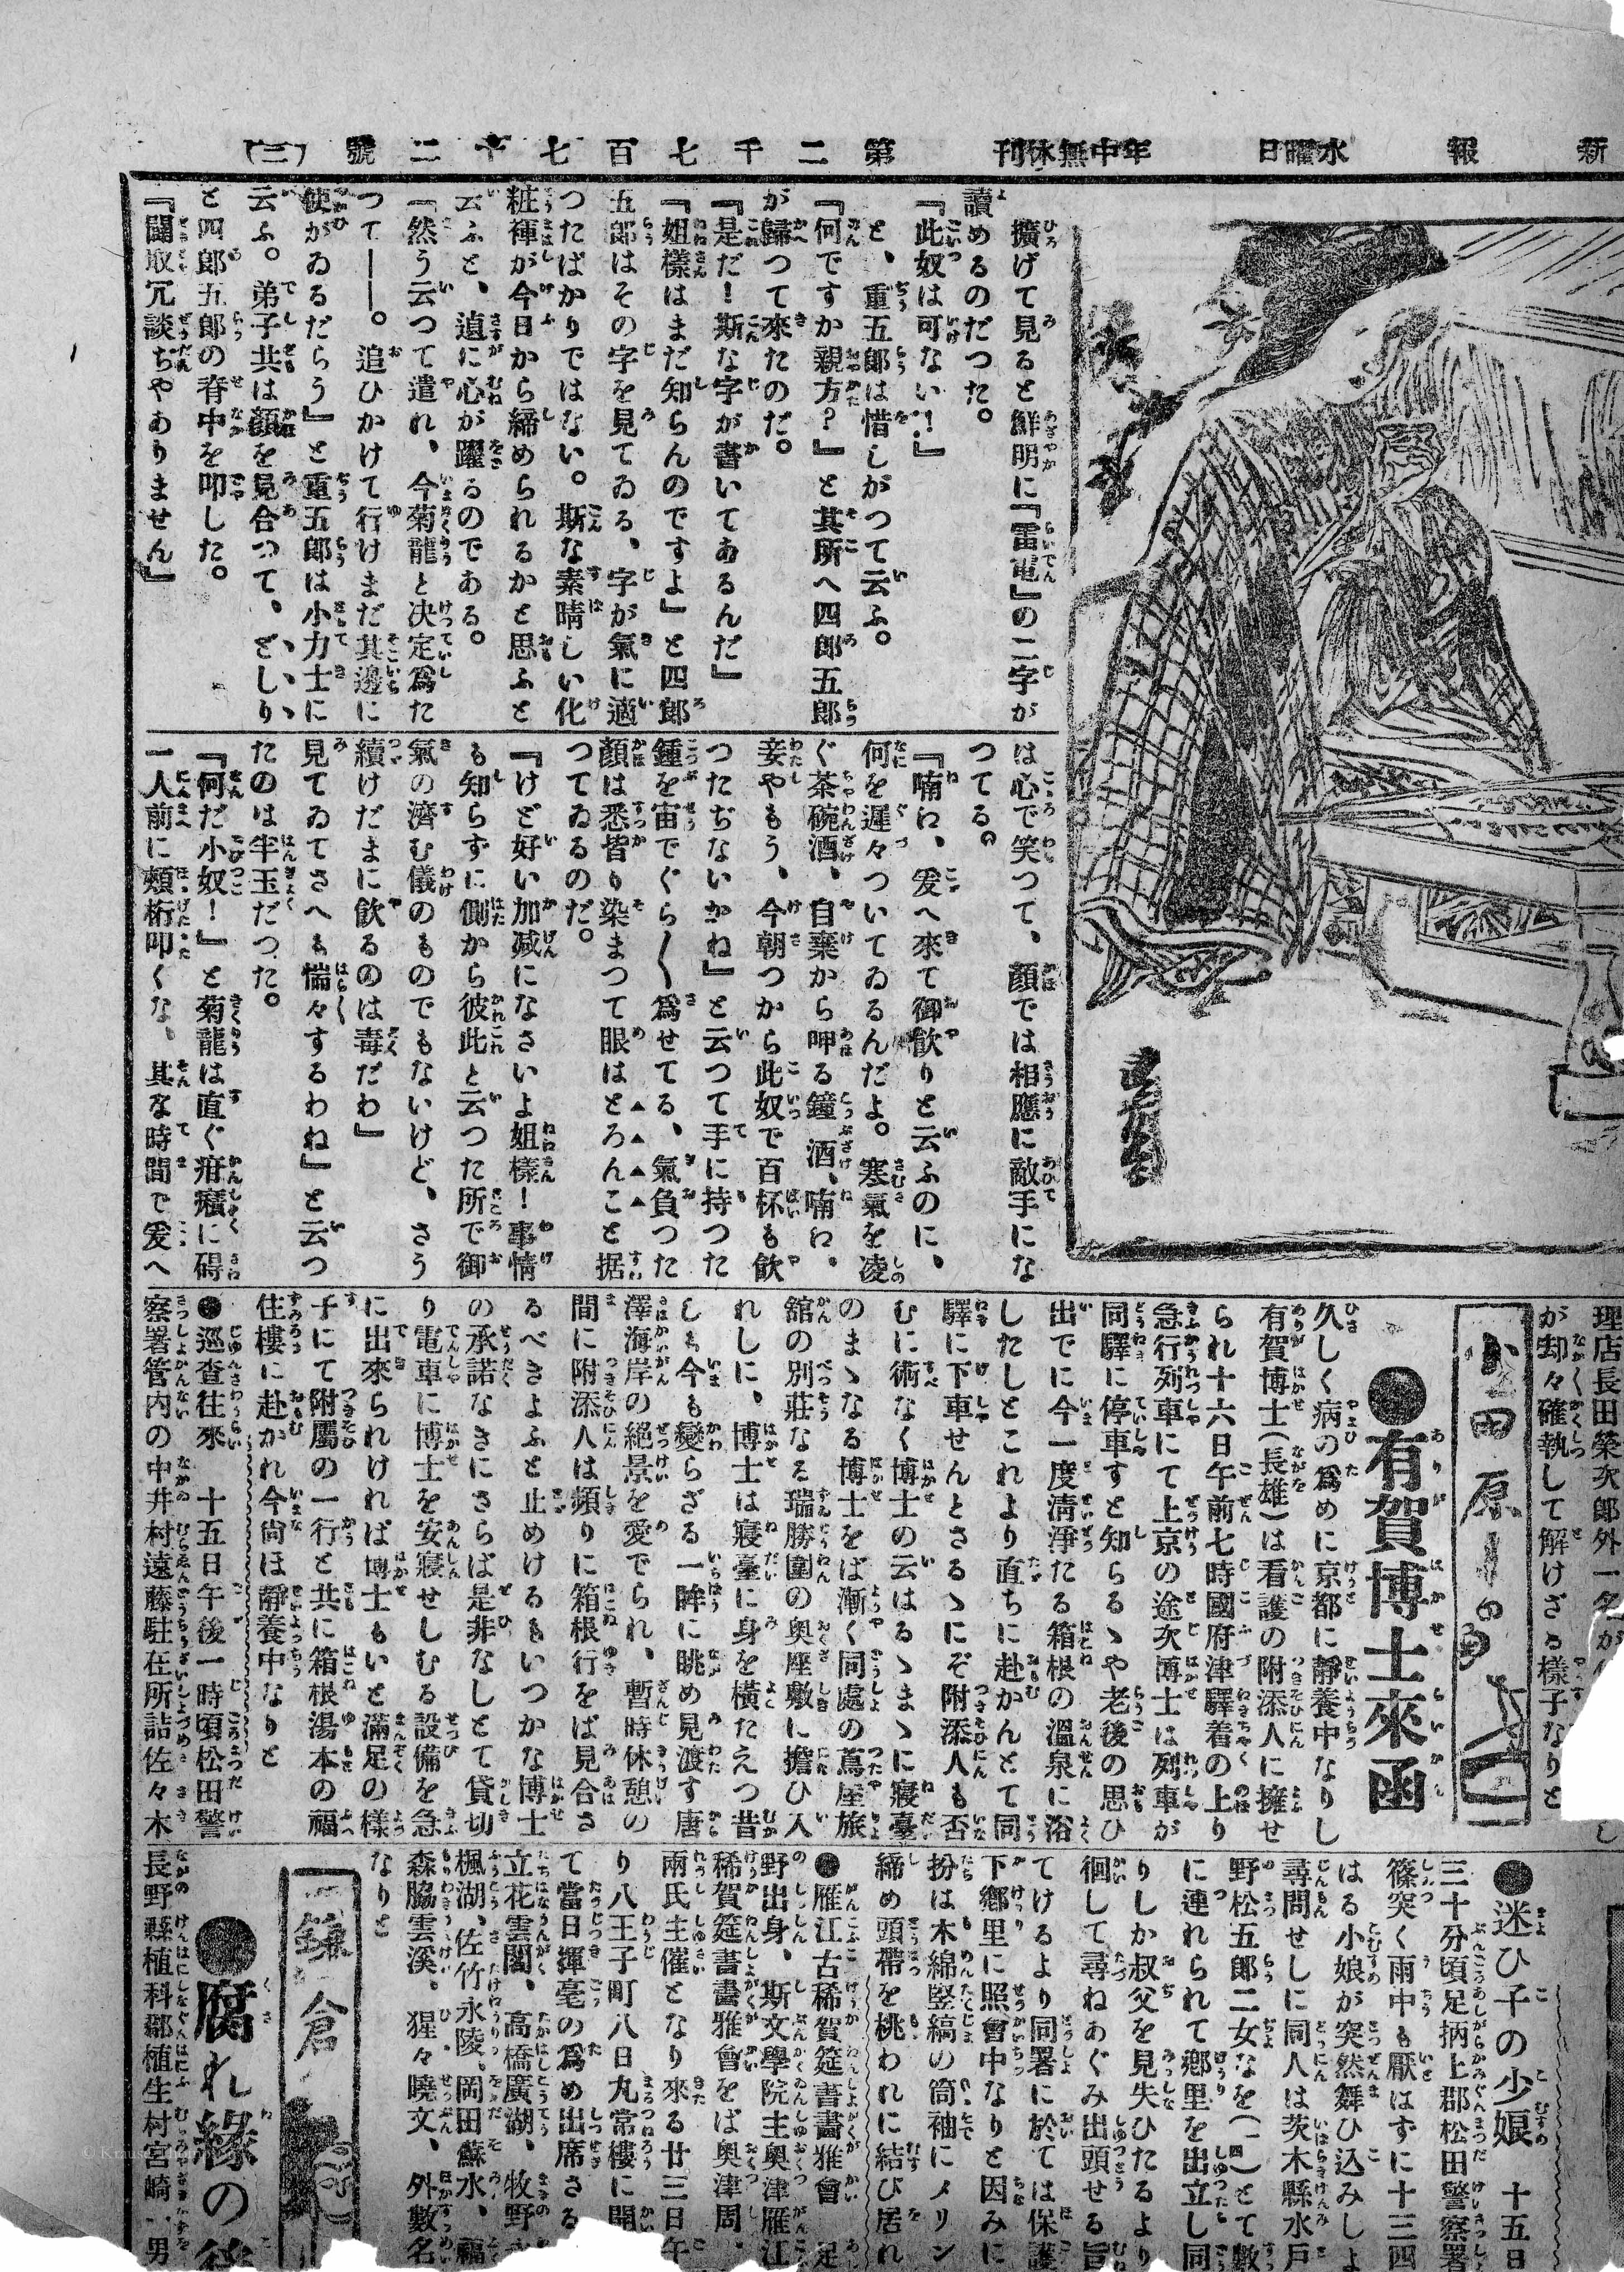 Far East newspaper